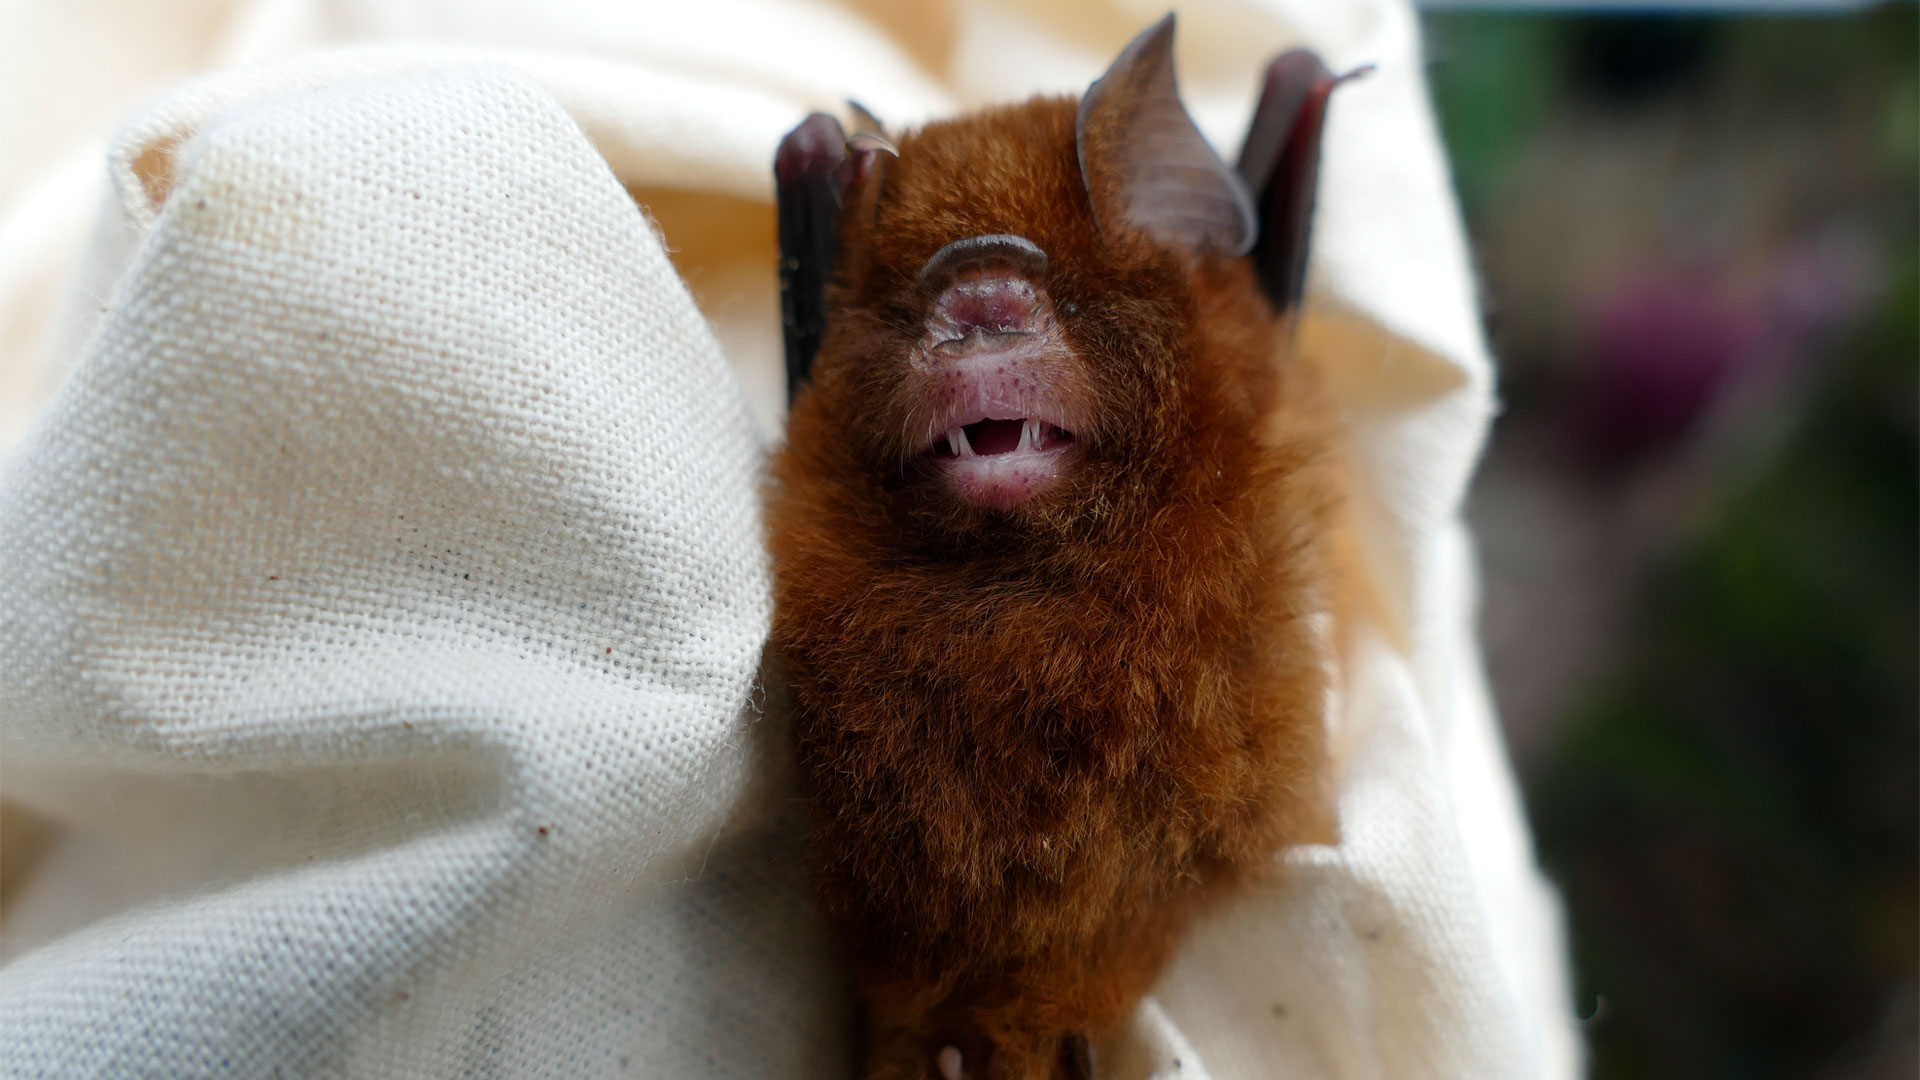 https://rfacdn.nz/zoo/assets/media/bougainville-bat-gallery-3.jpg